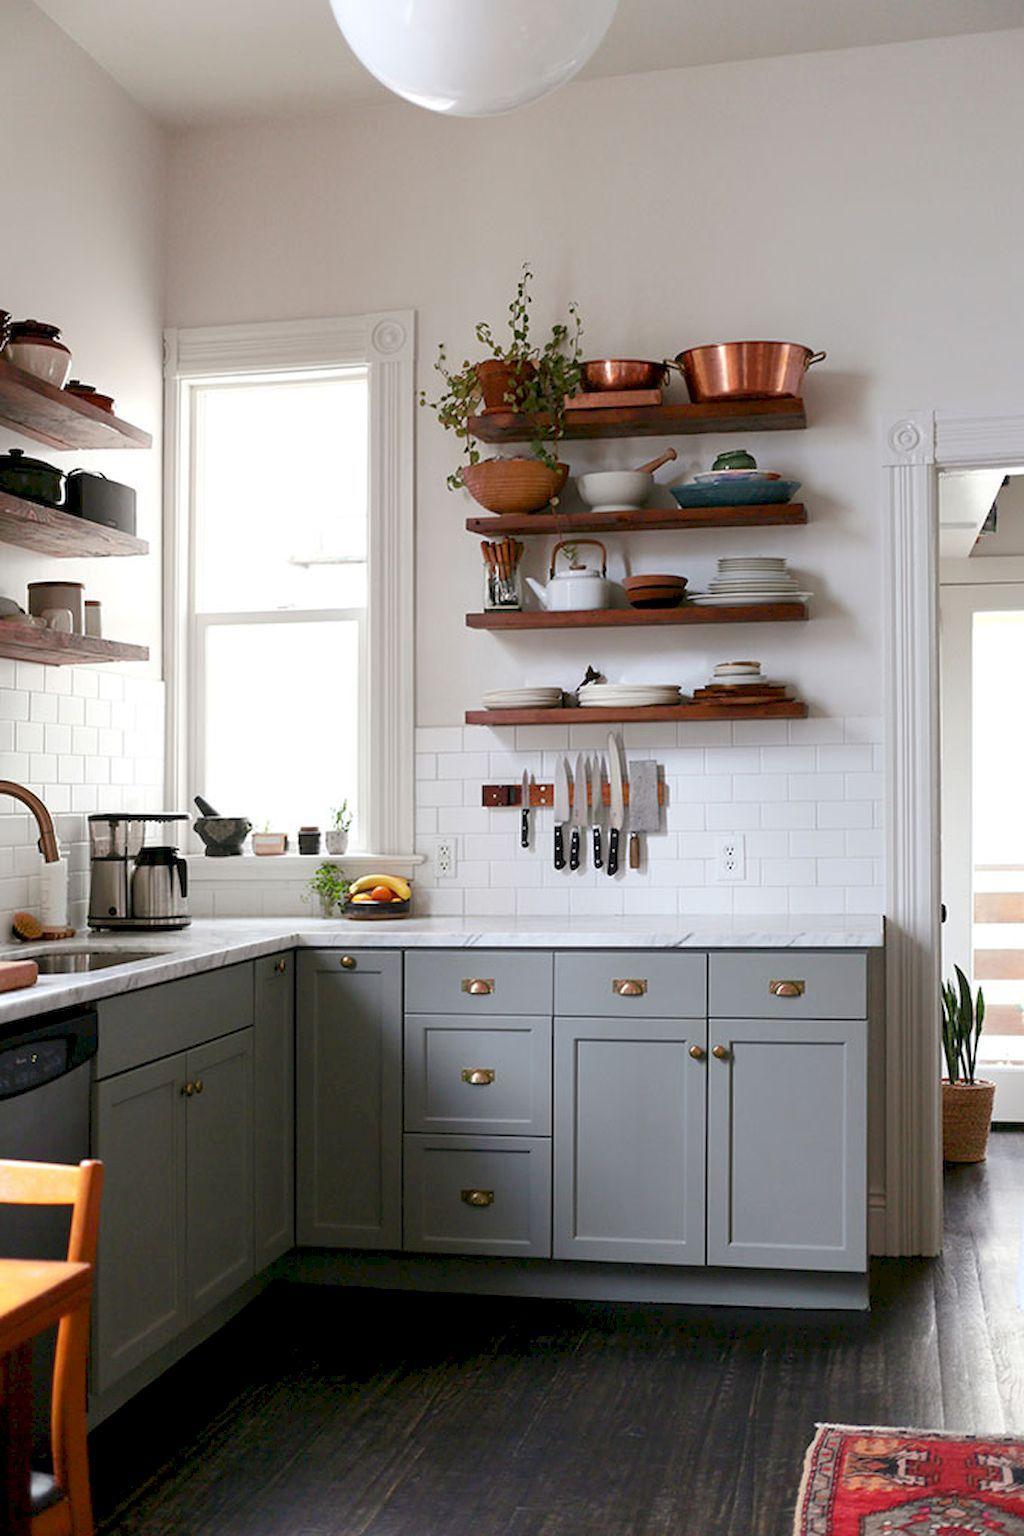 85 Rustic Kitchen Decor with Open Shelves Ideas | Kitchen ...